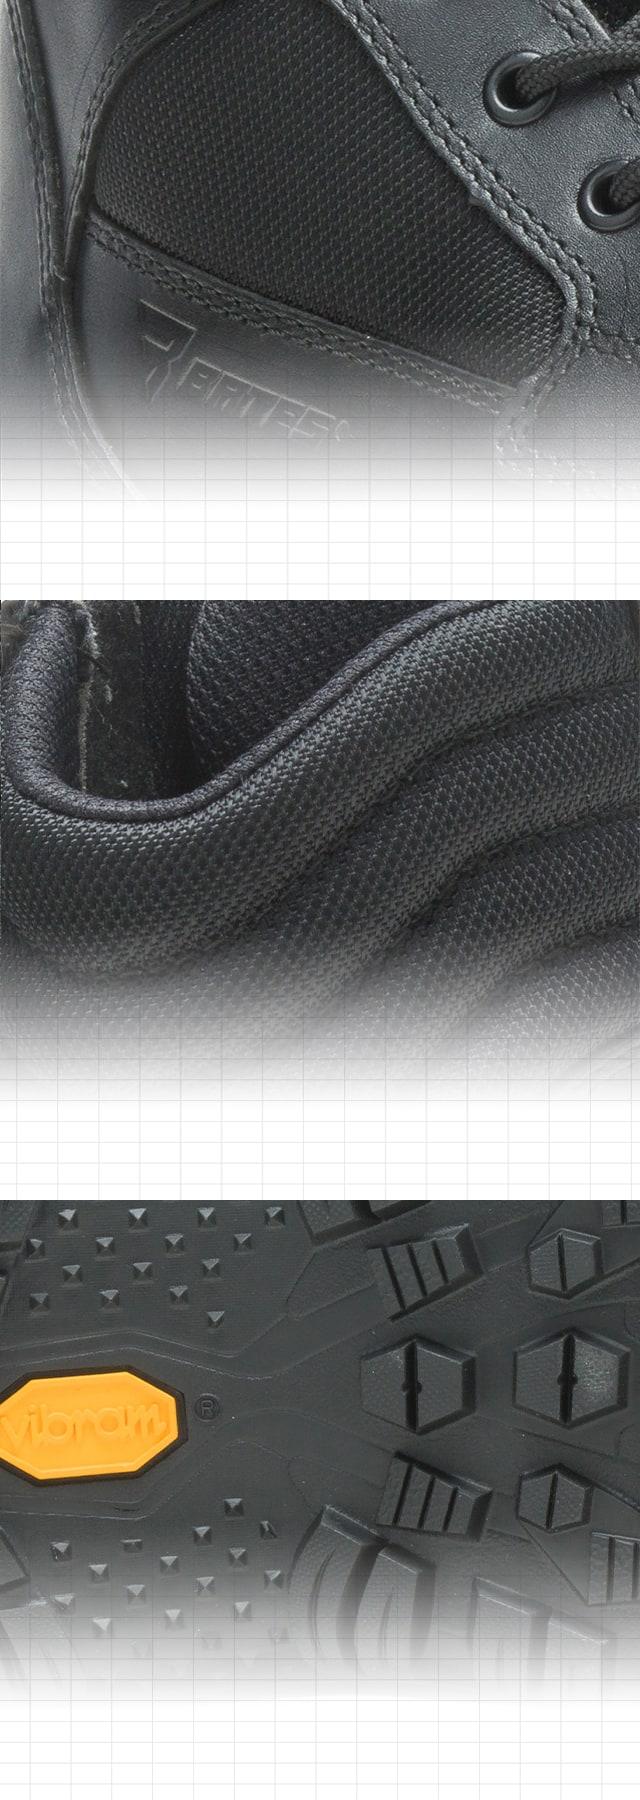 Gallery of Cyren boot features.